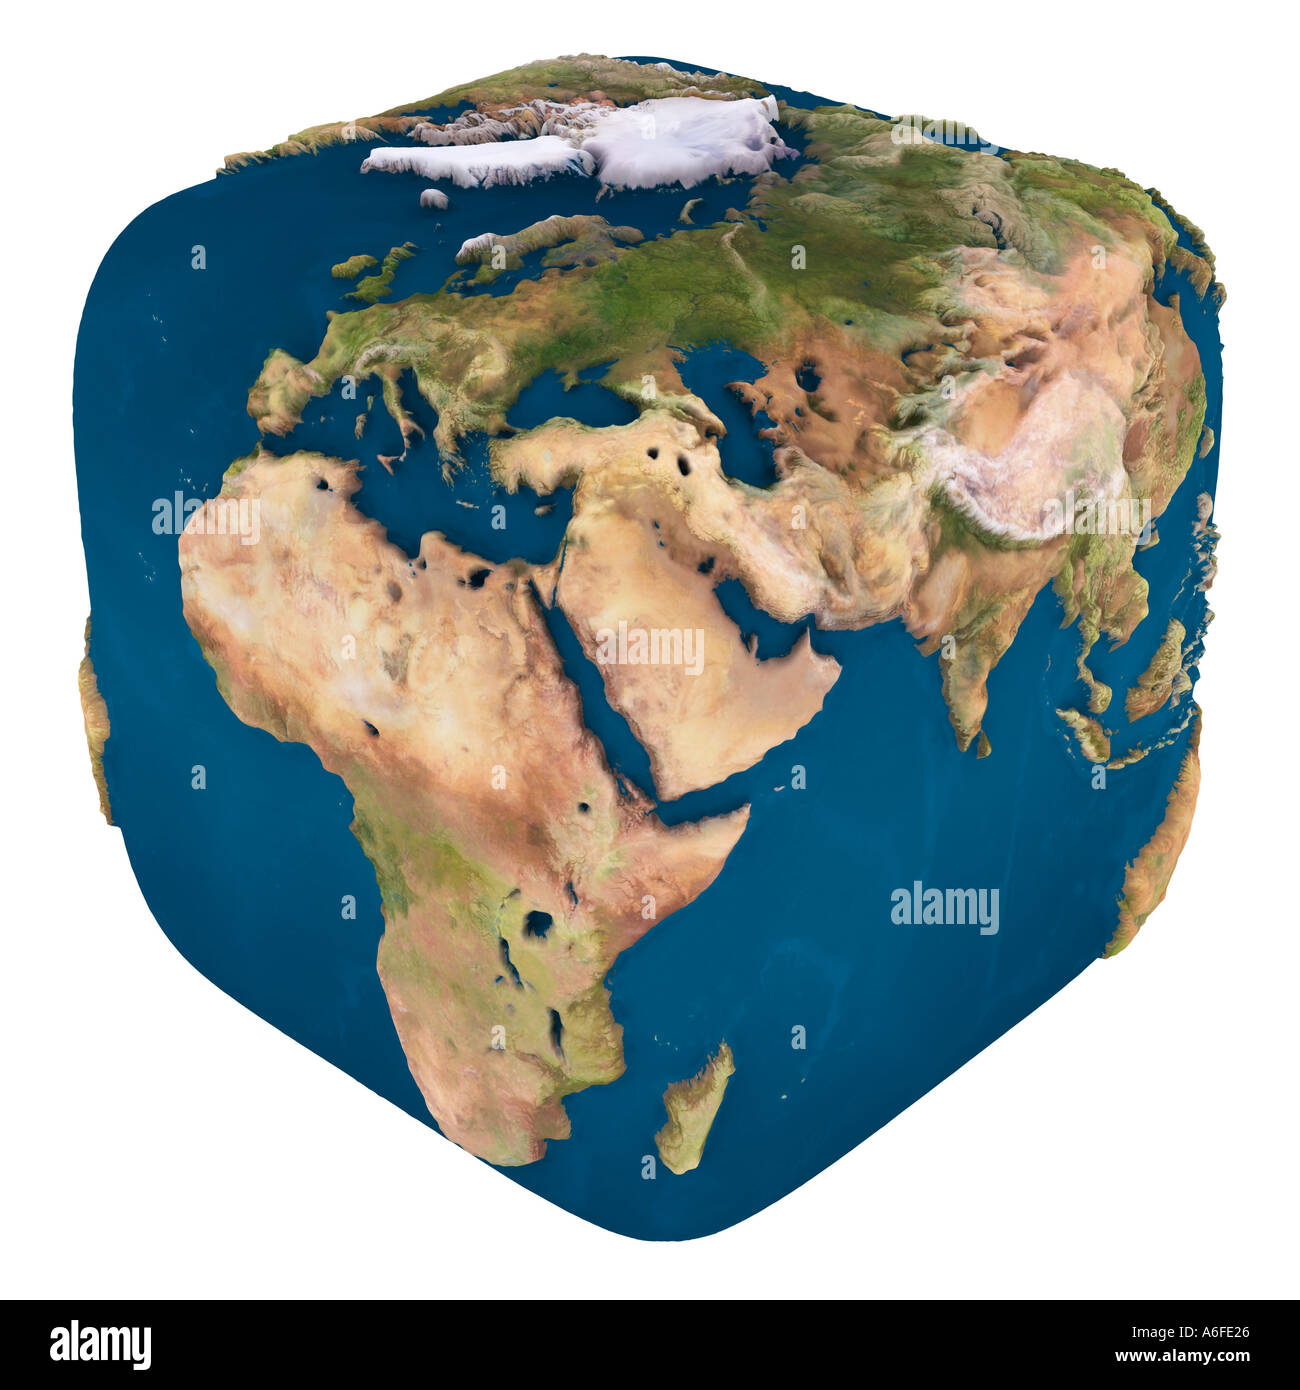 Square Earth Map.Square Earth Globe Stock Photo 458278 Alamy